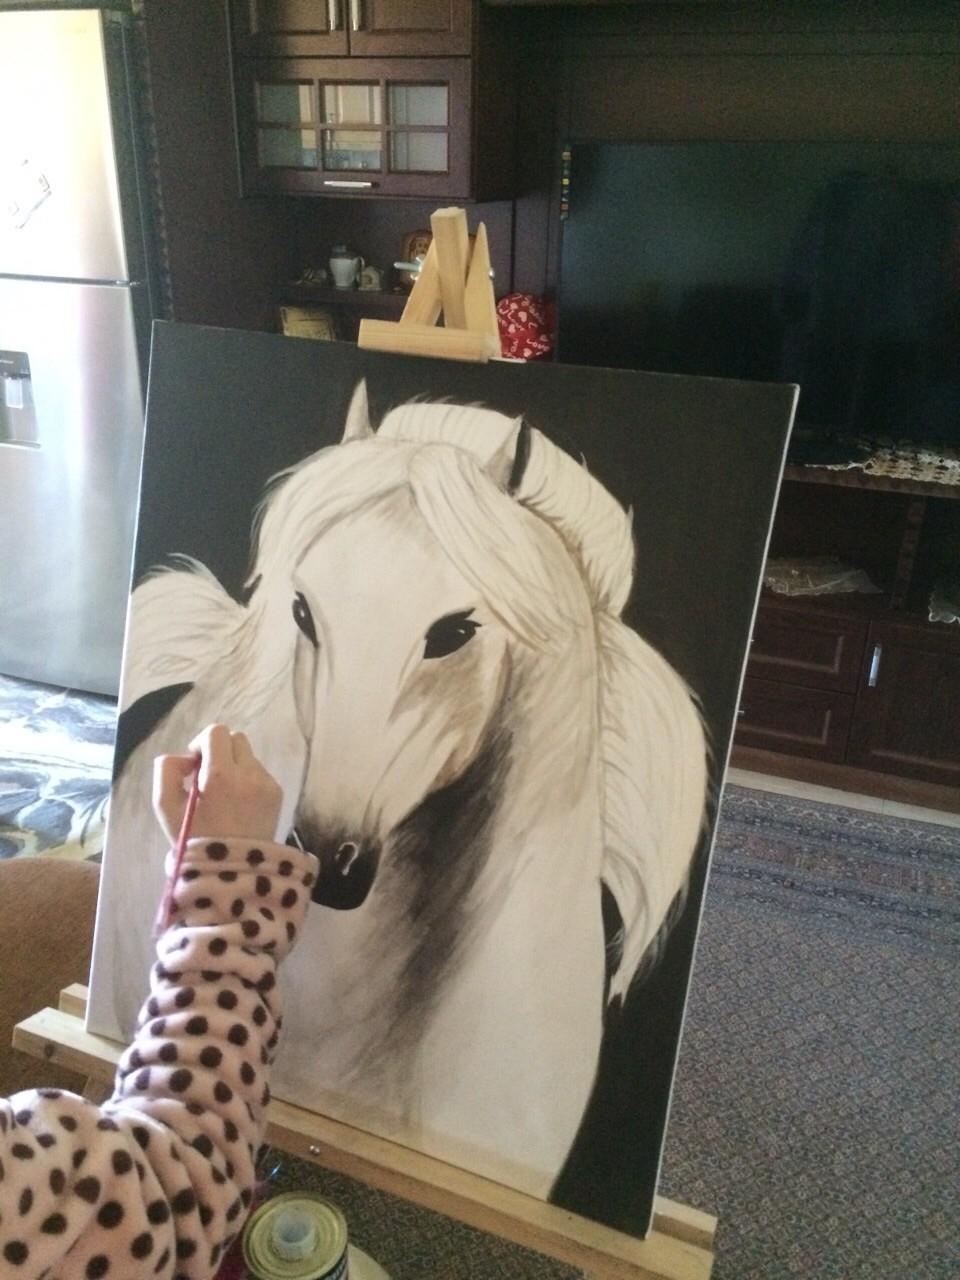 رسم ابنتي وعمرها 15 عاما . .ادعوا لها بالتوفيق